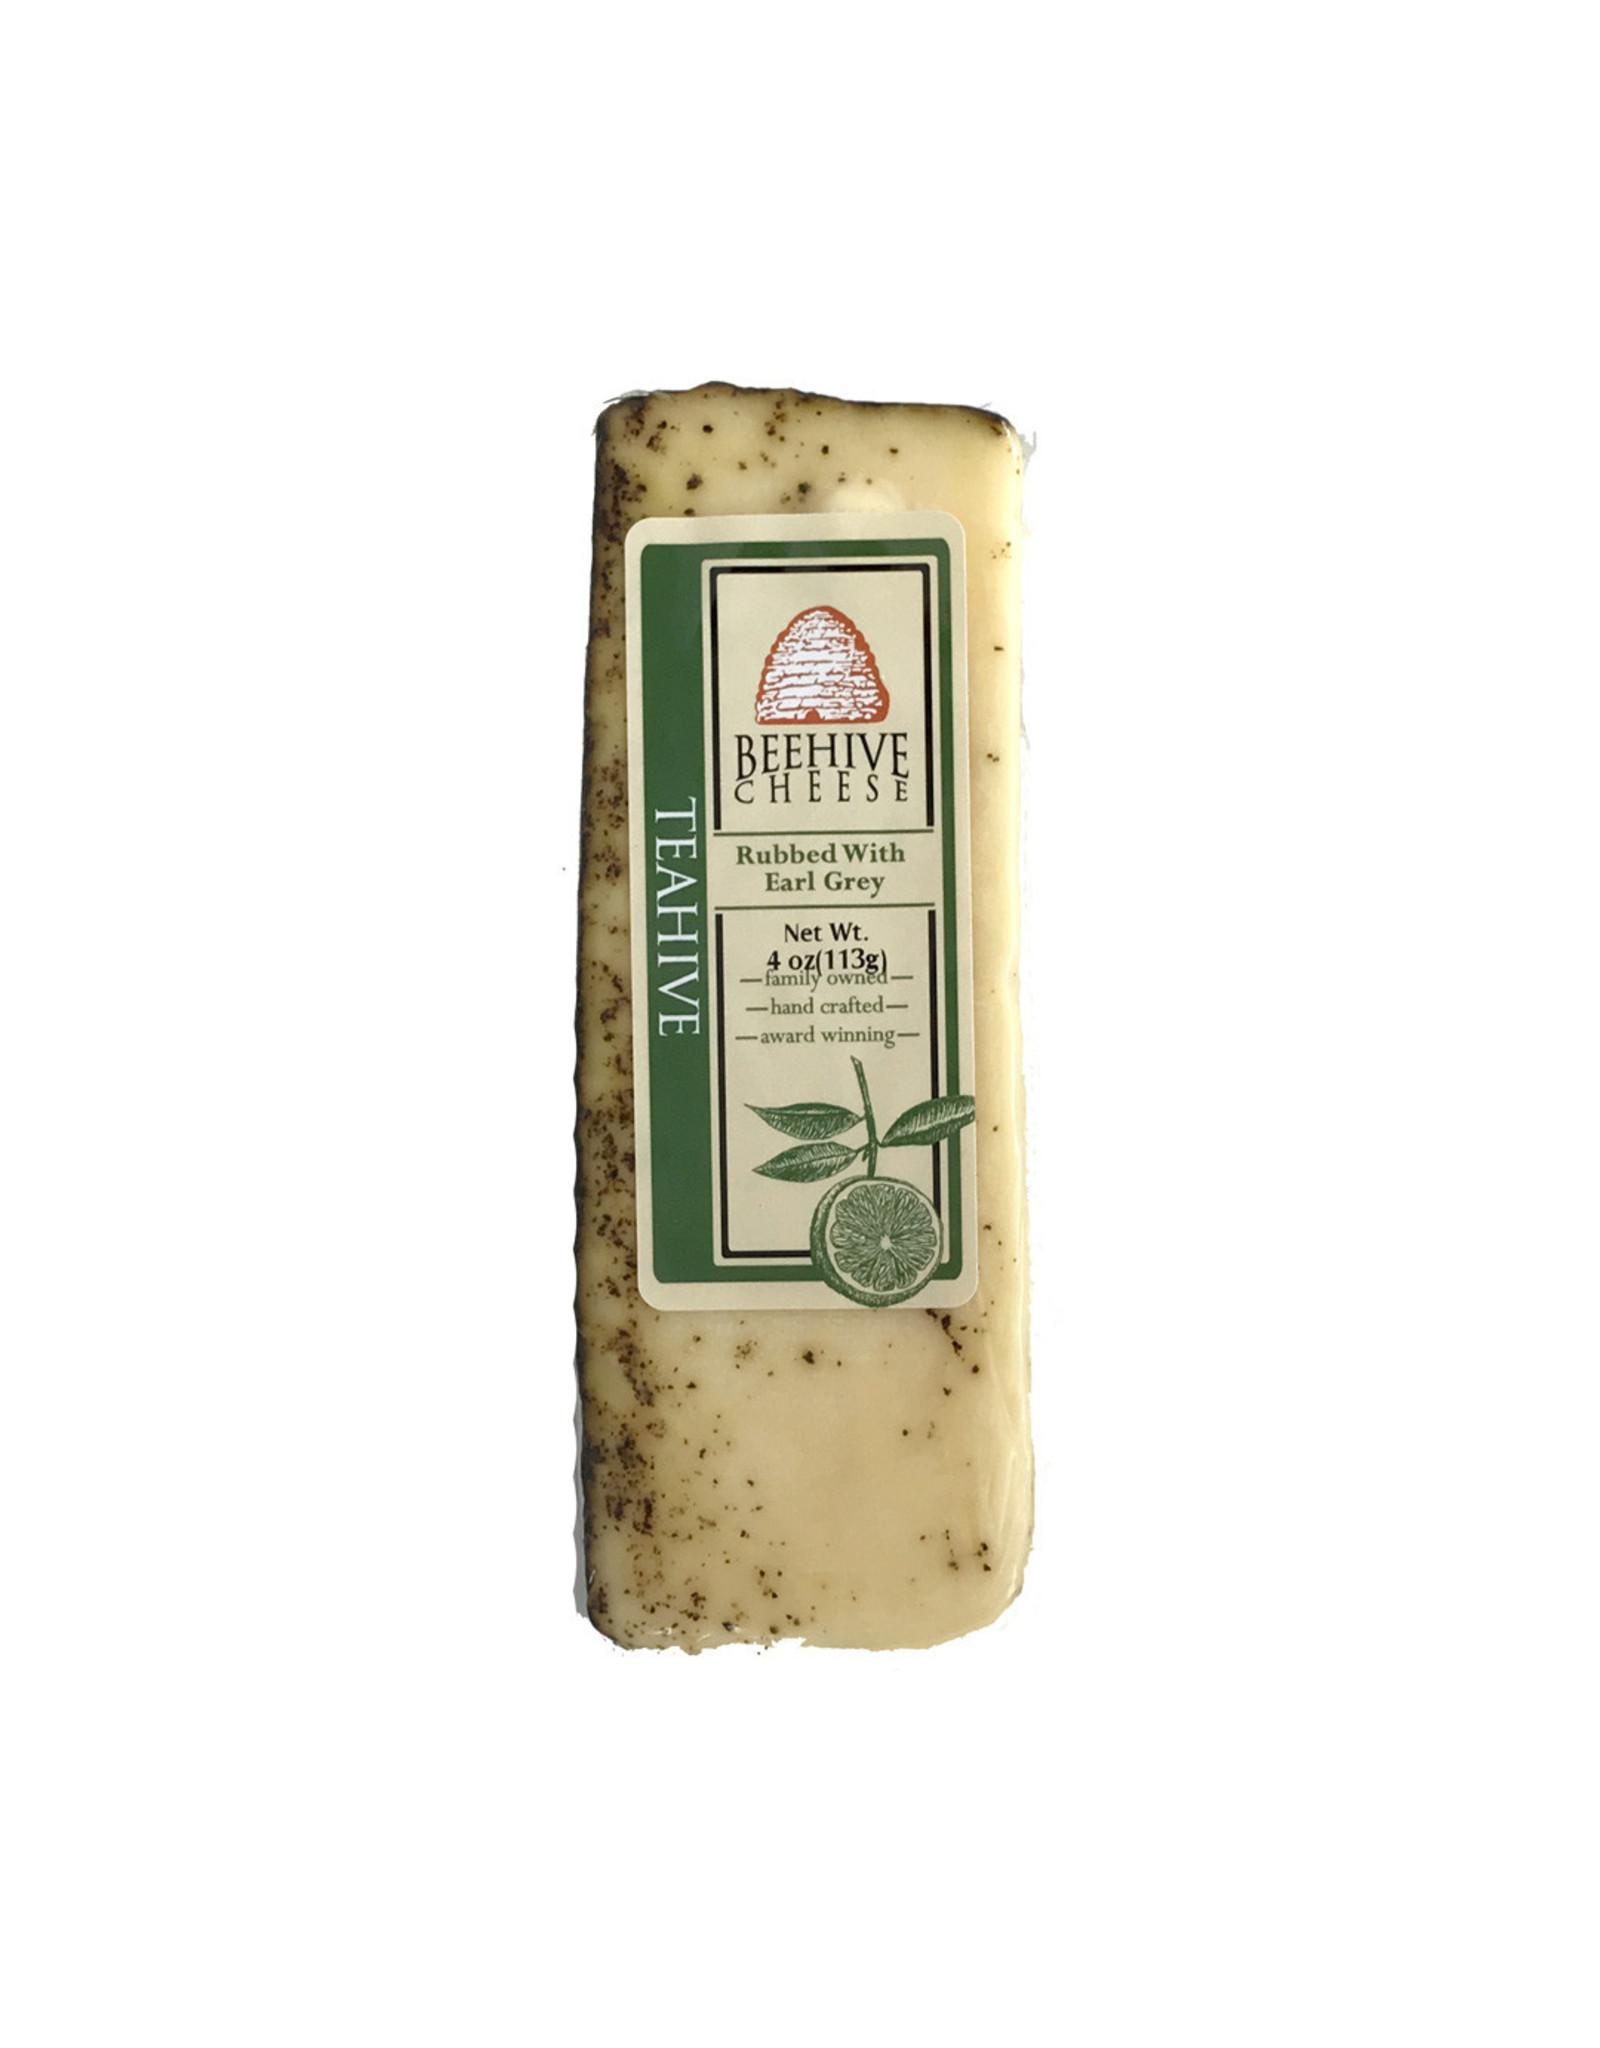 Beehive Cheese Teahive with Earl Grey